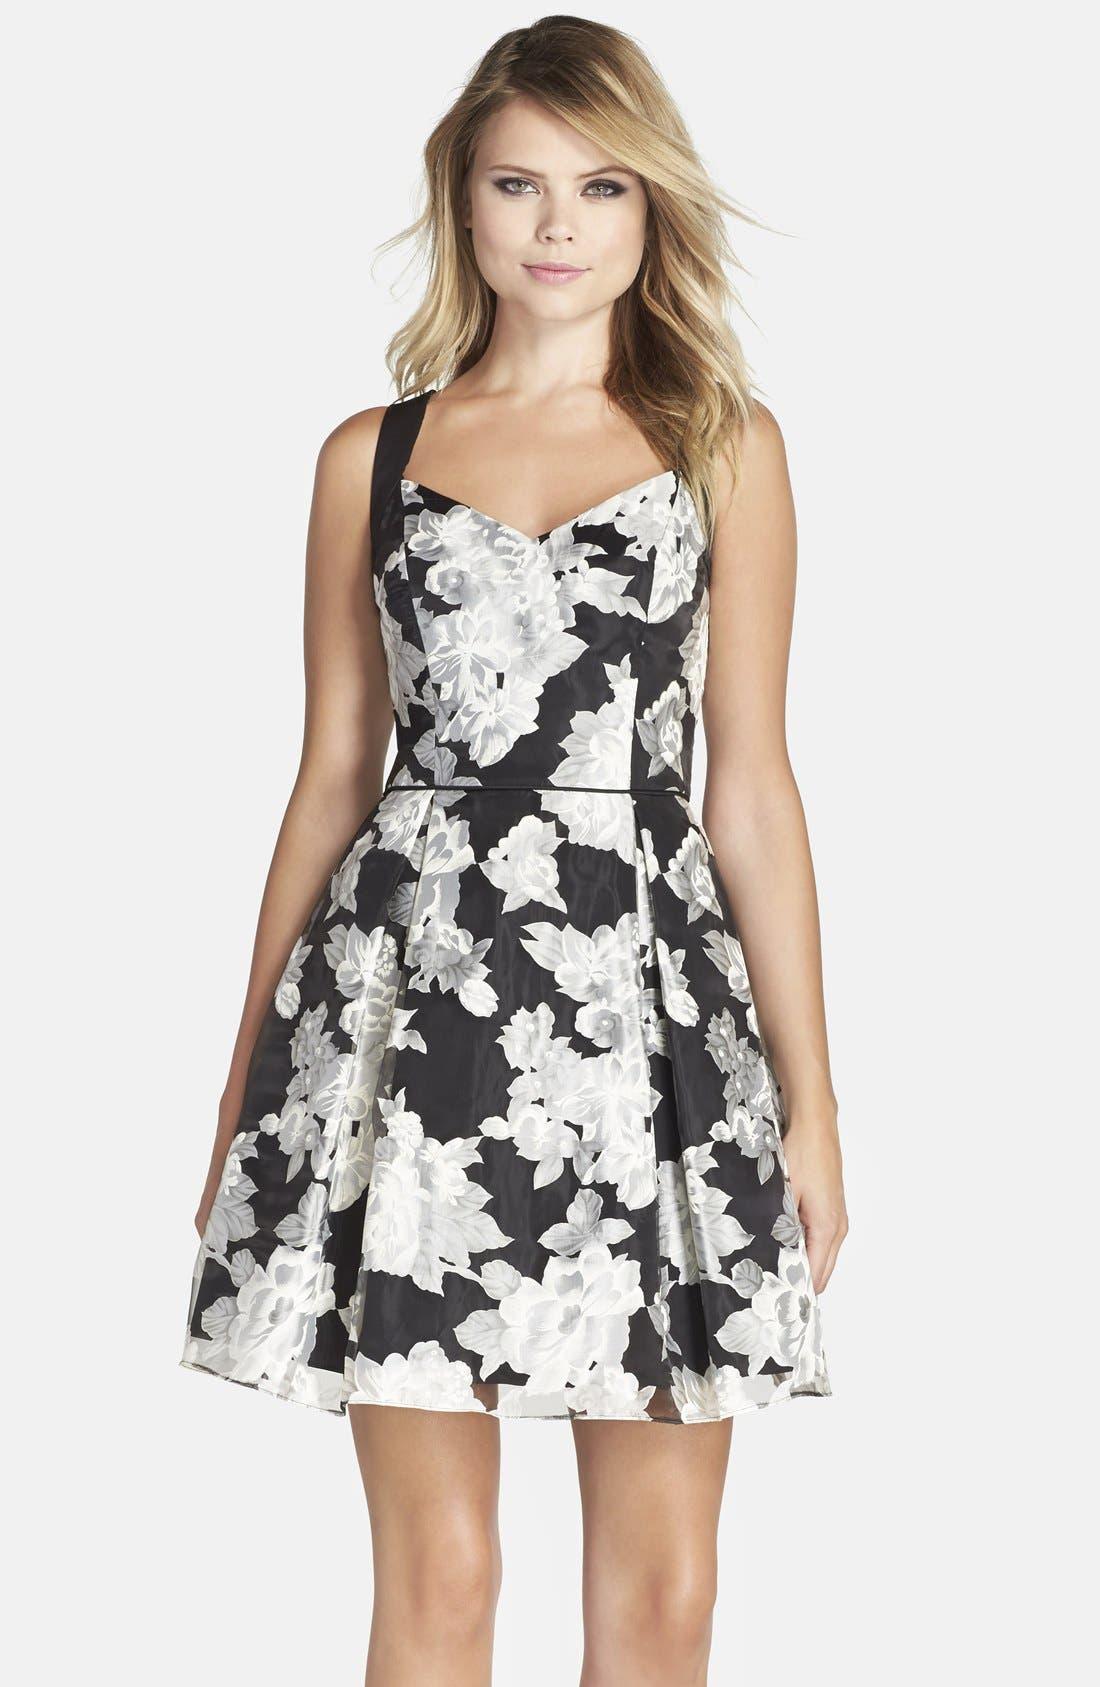 Alternate Image 1 Selected - Aidan by Aidan Mattox Floral Print Fit & Flare Dress